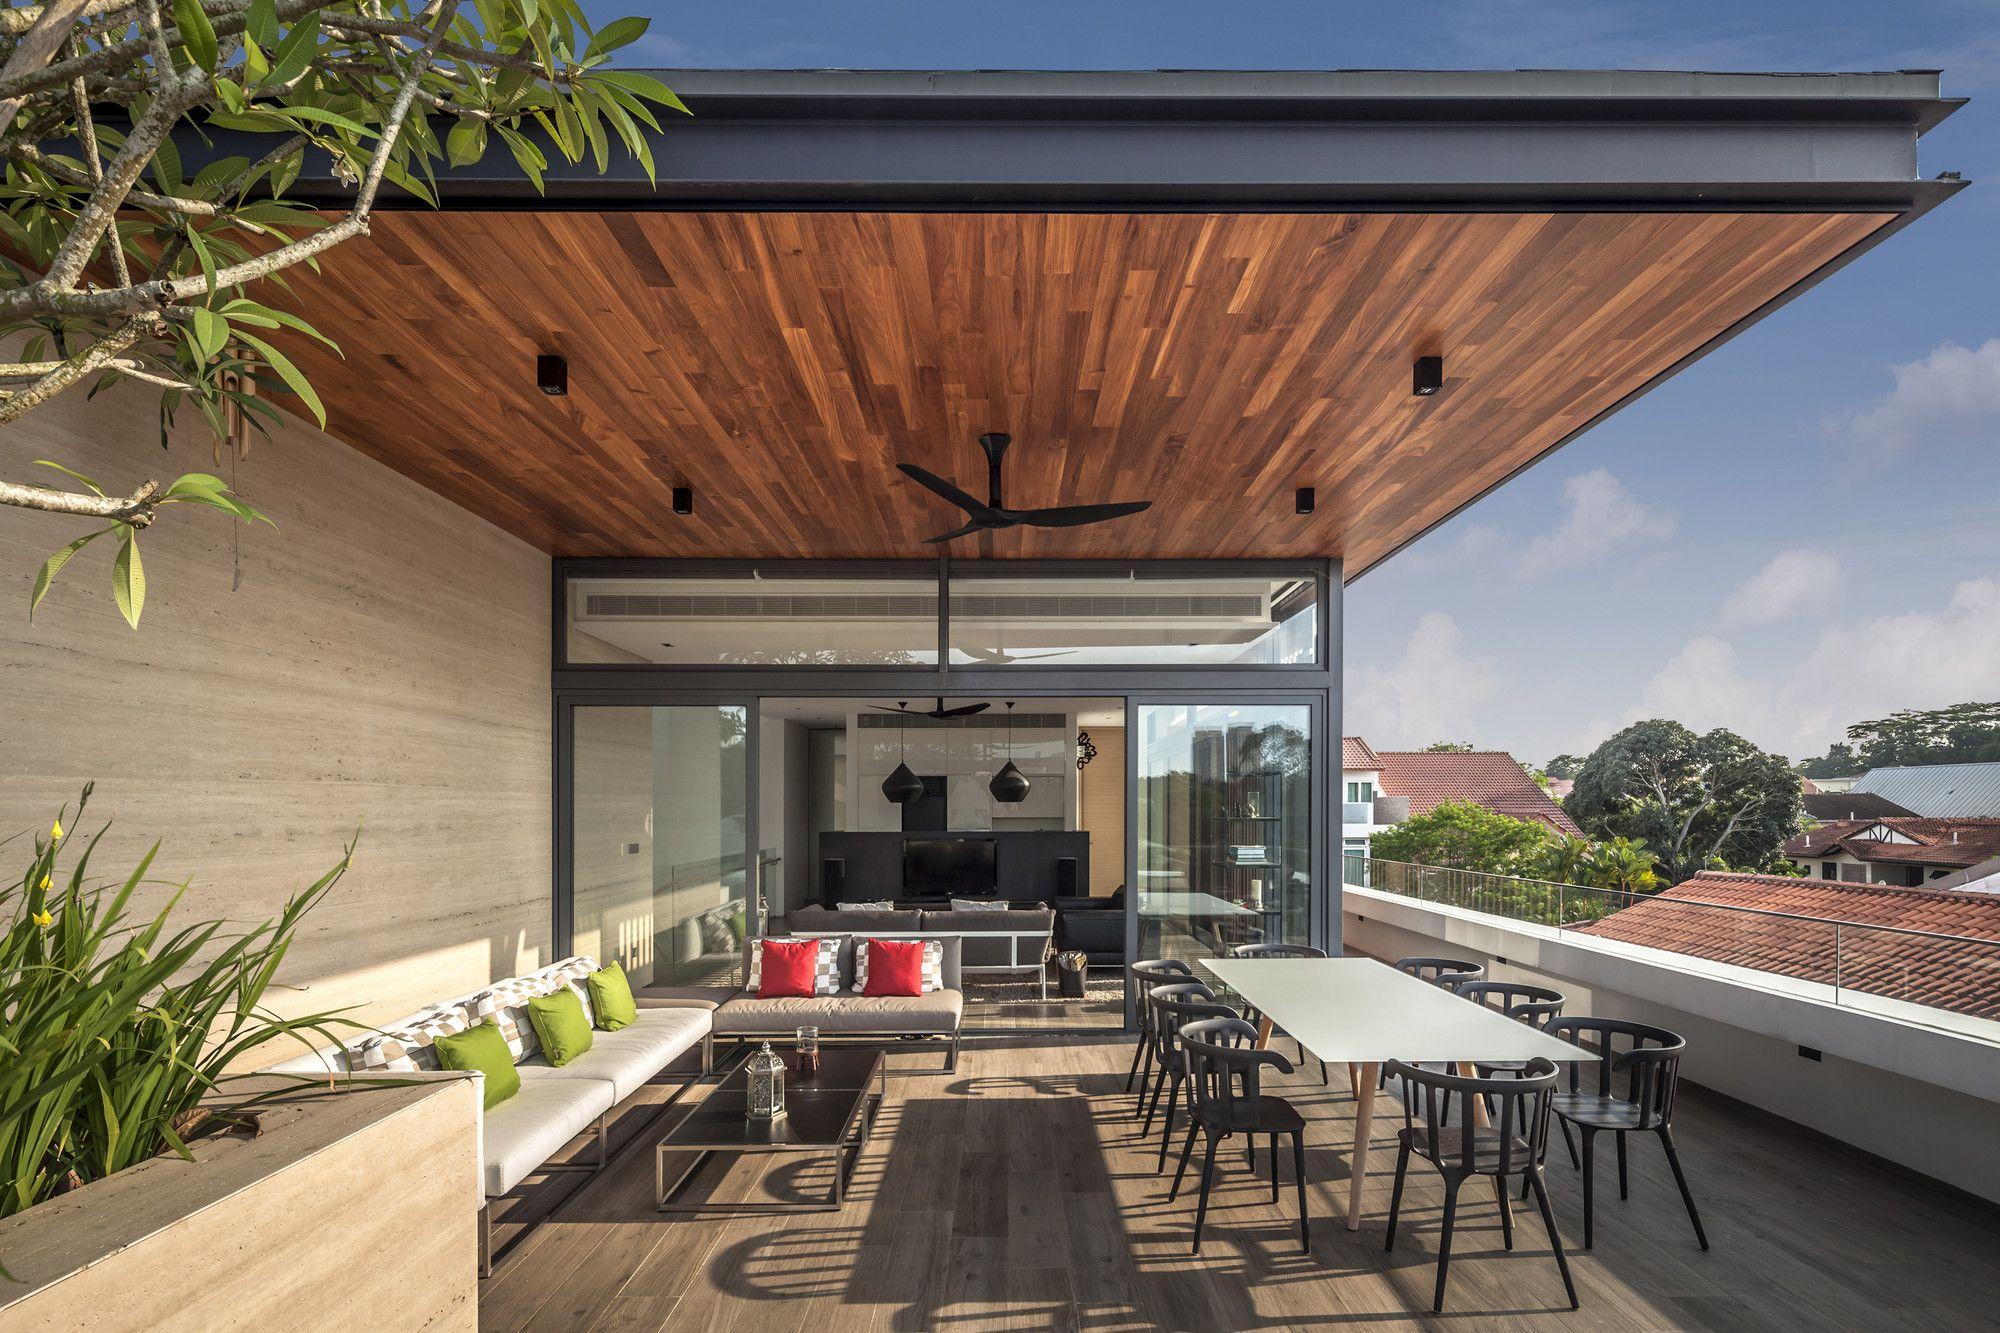 Galería de Casa Vista Lejana / Wallflower Architecture ... on Hhh Outdoor Living id=35423